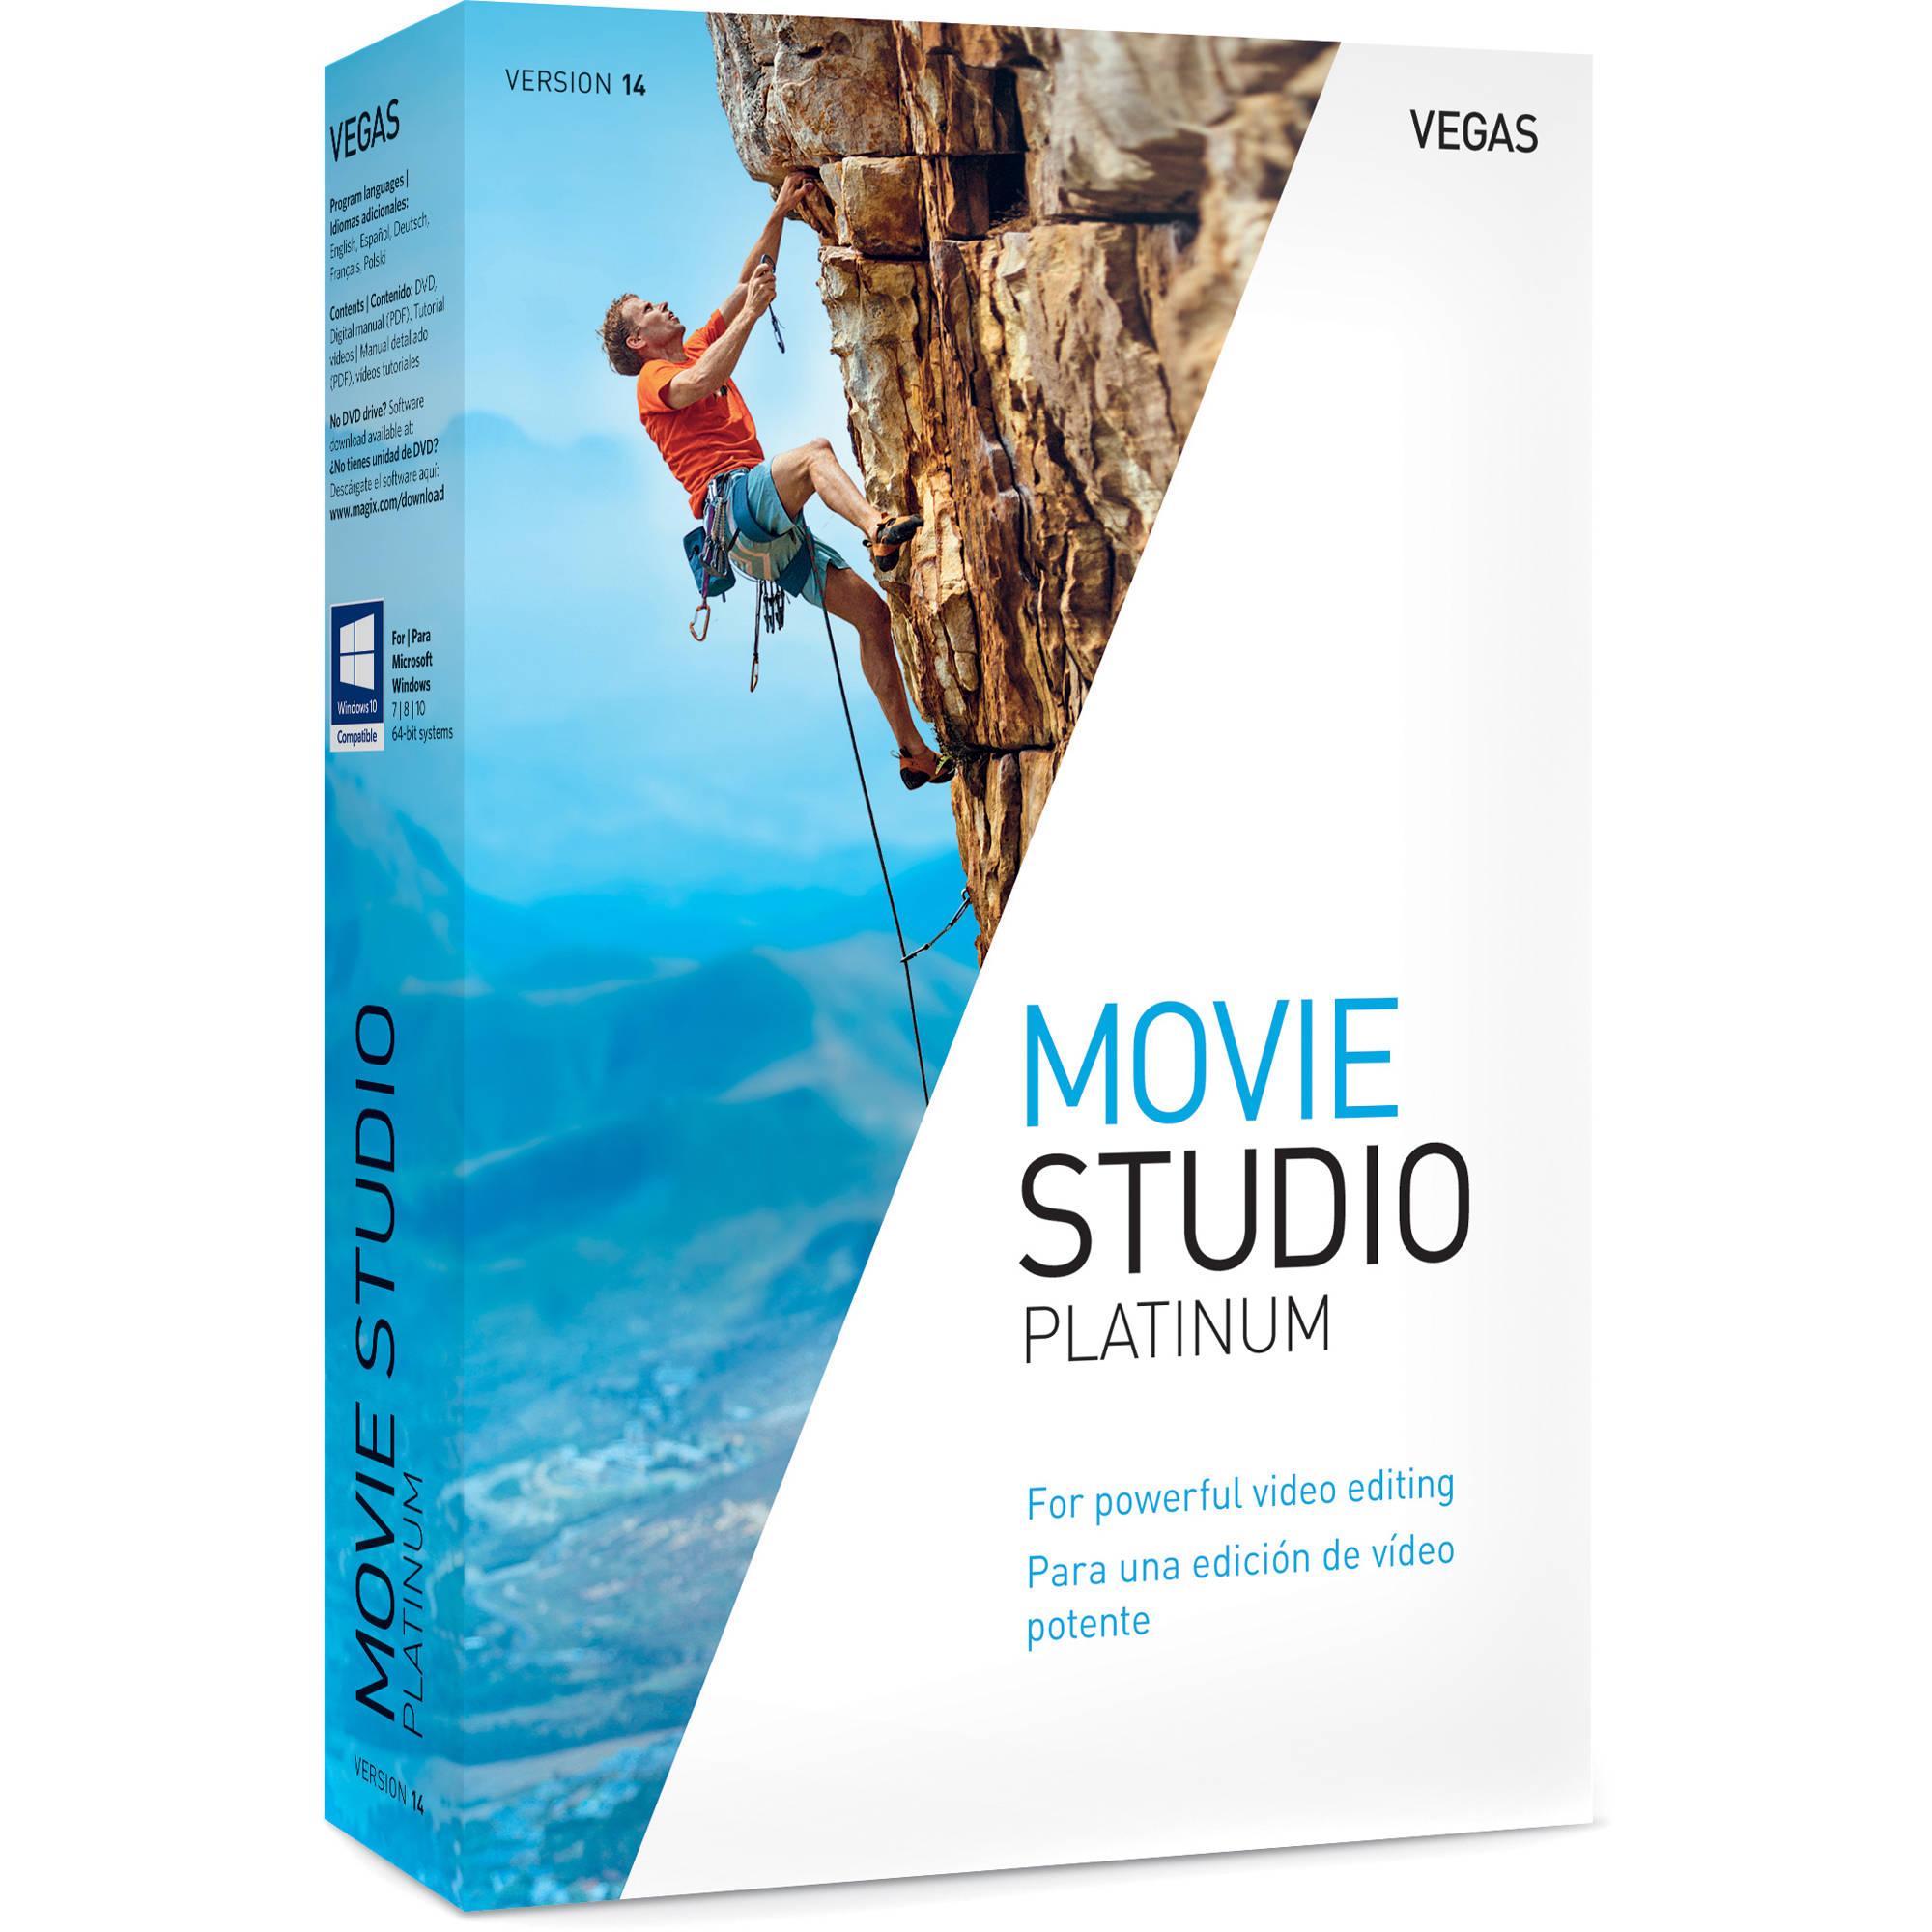 Magix samplitude music studio 15 | software downloads | techworld.